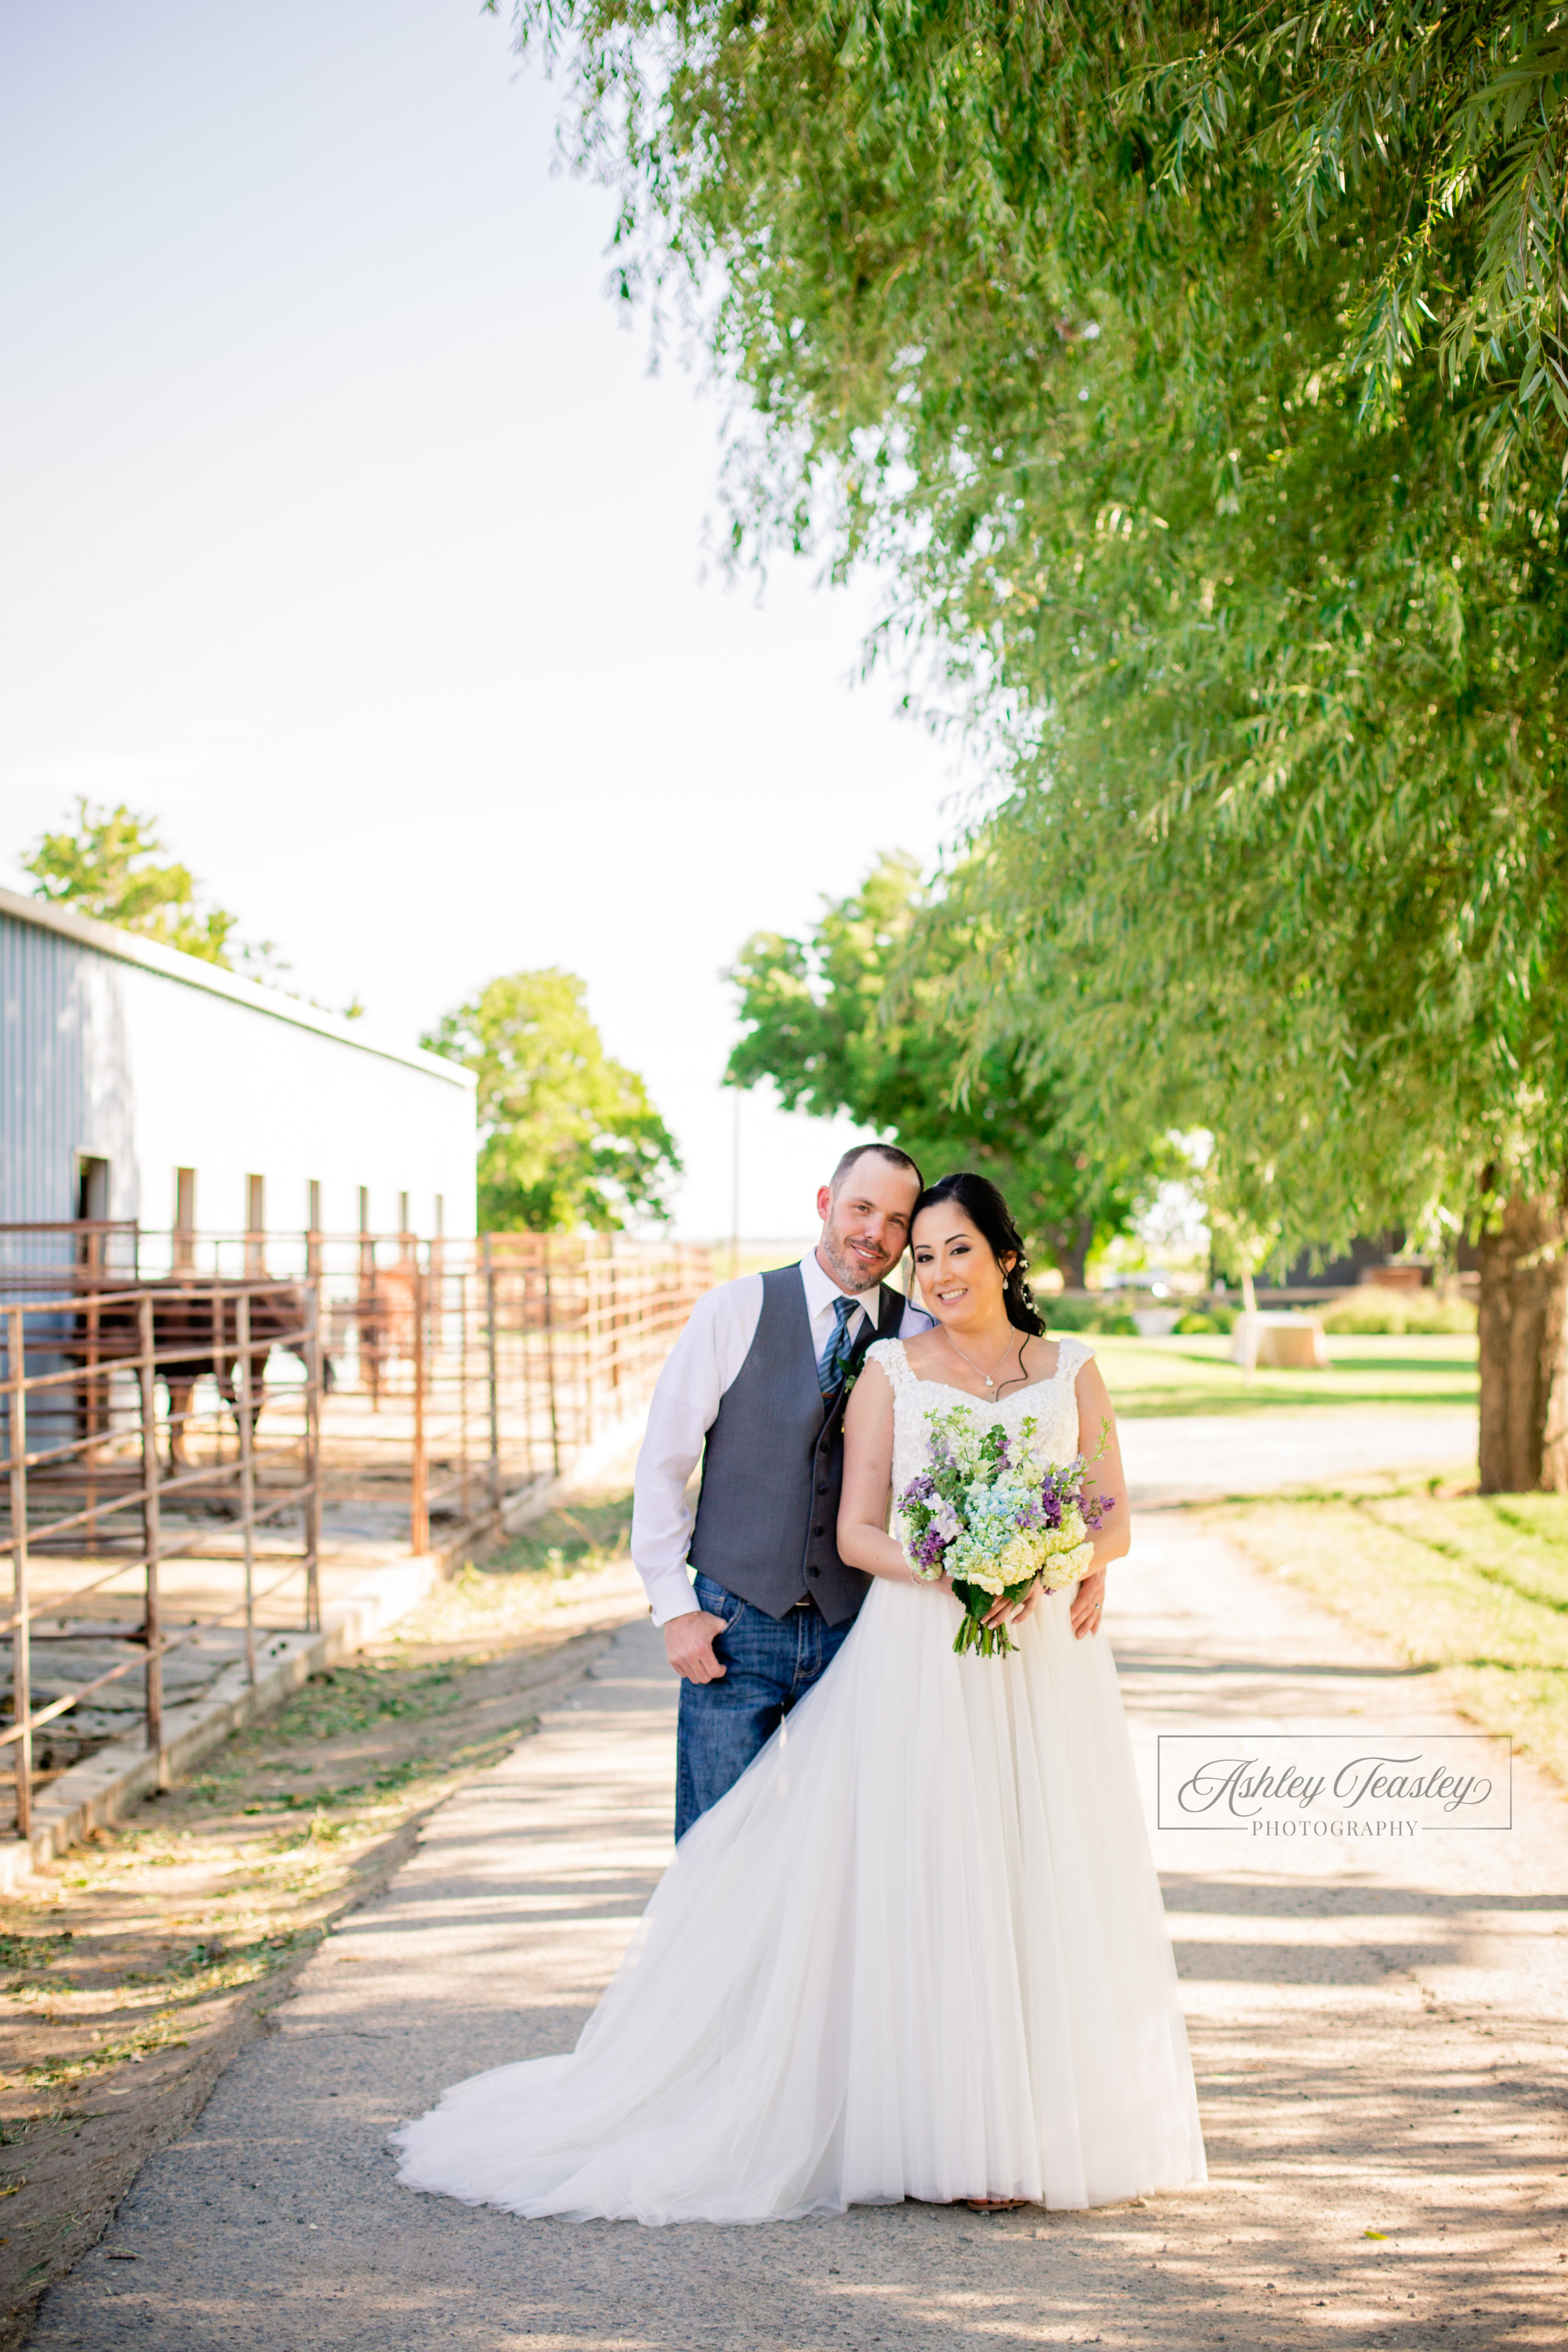 Jeanette & Rance - Butte Star Ranch - Sacramento Wedding Photographer - Ashley Teasley Photography (13 of 41).jpg